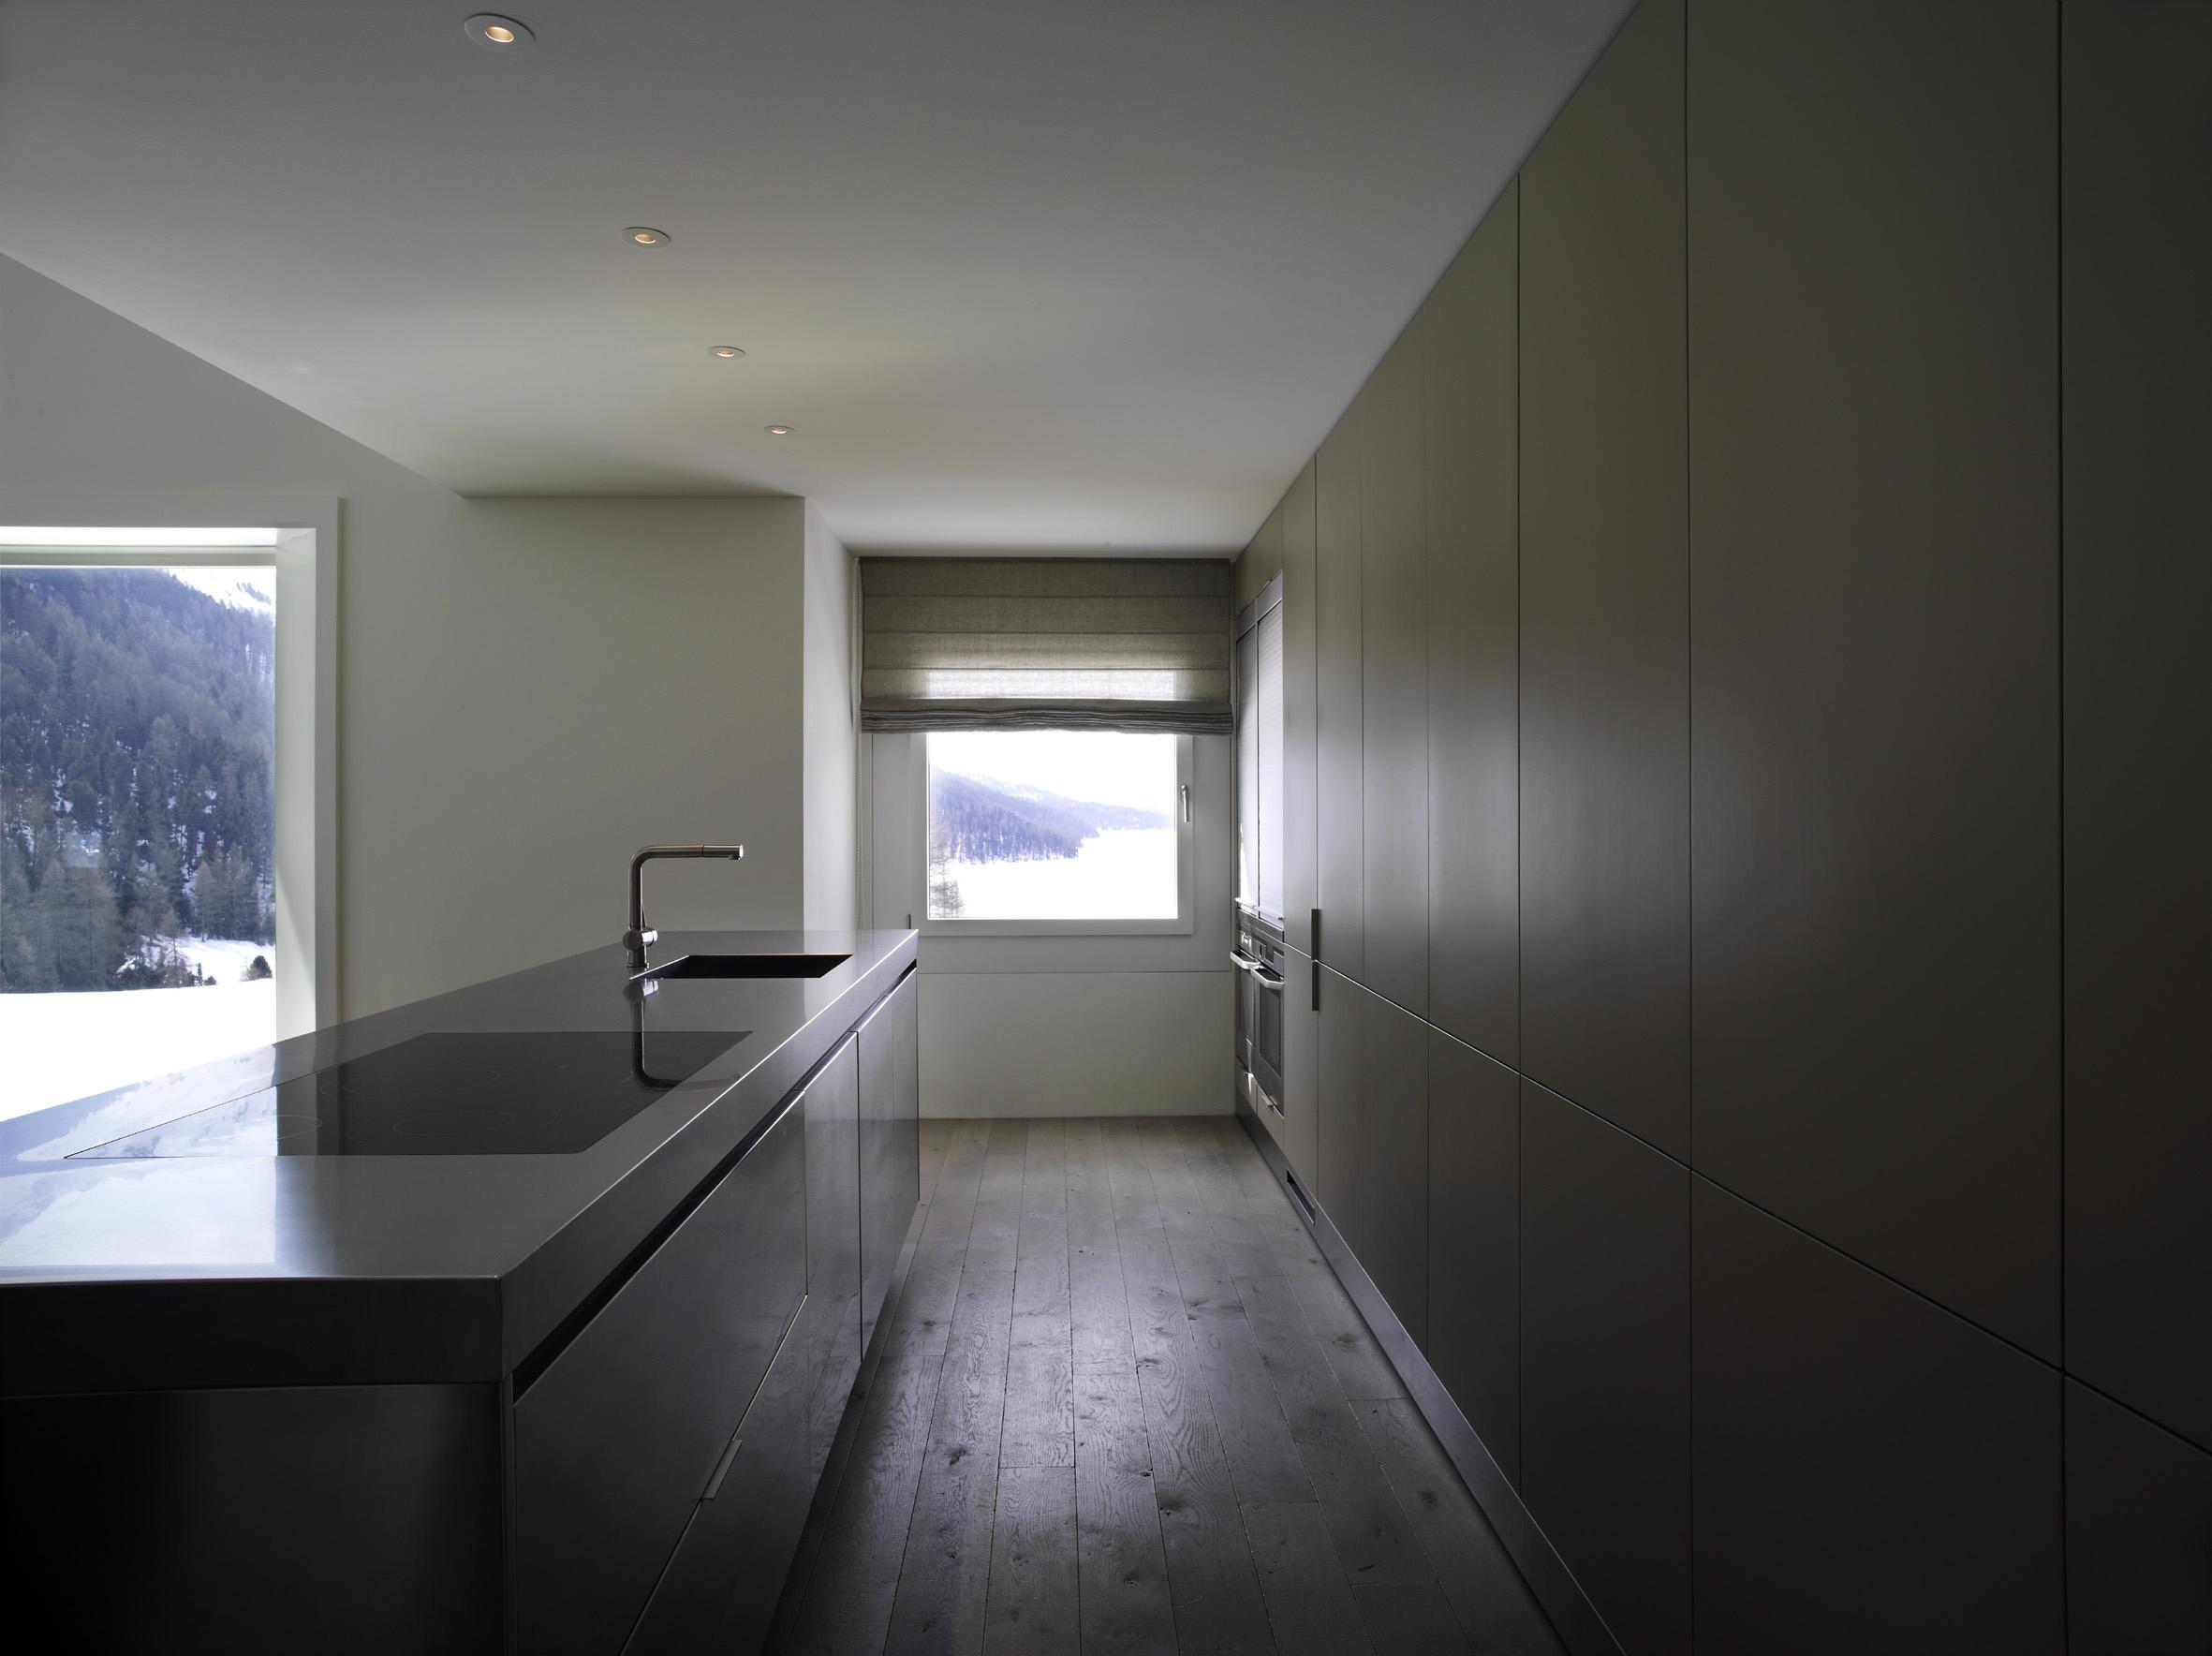 031_iria_degen_interiors_apartment_house_engadin3.jpg